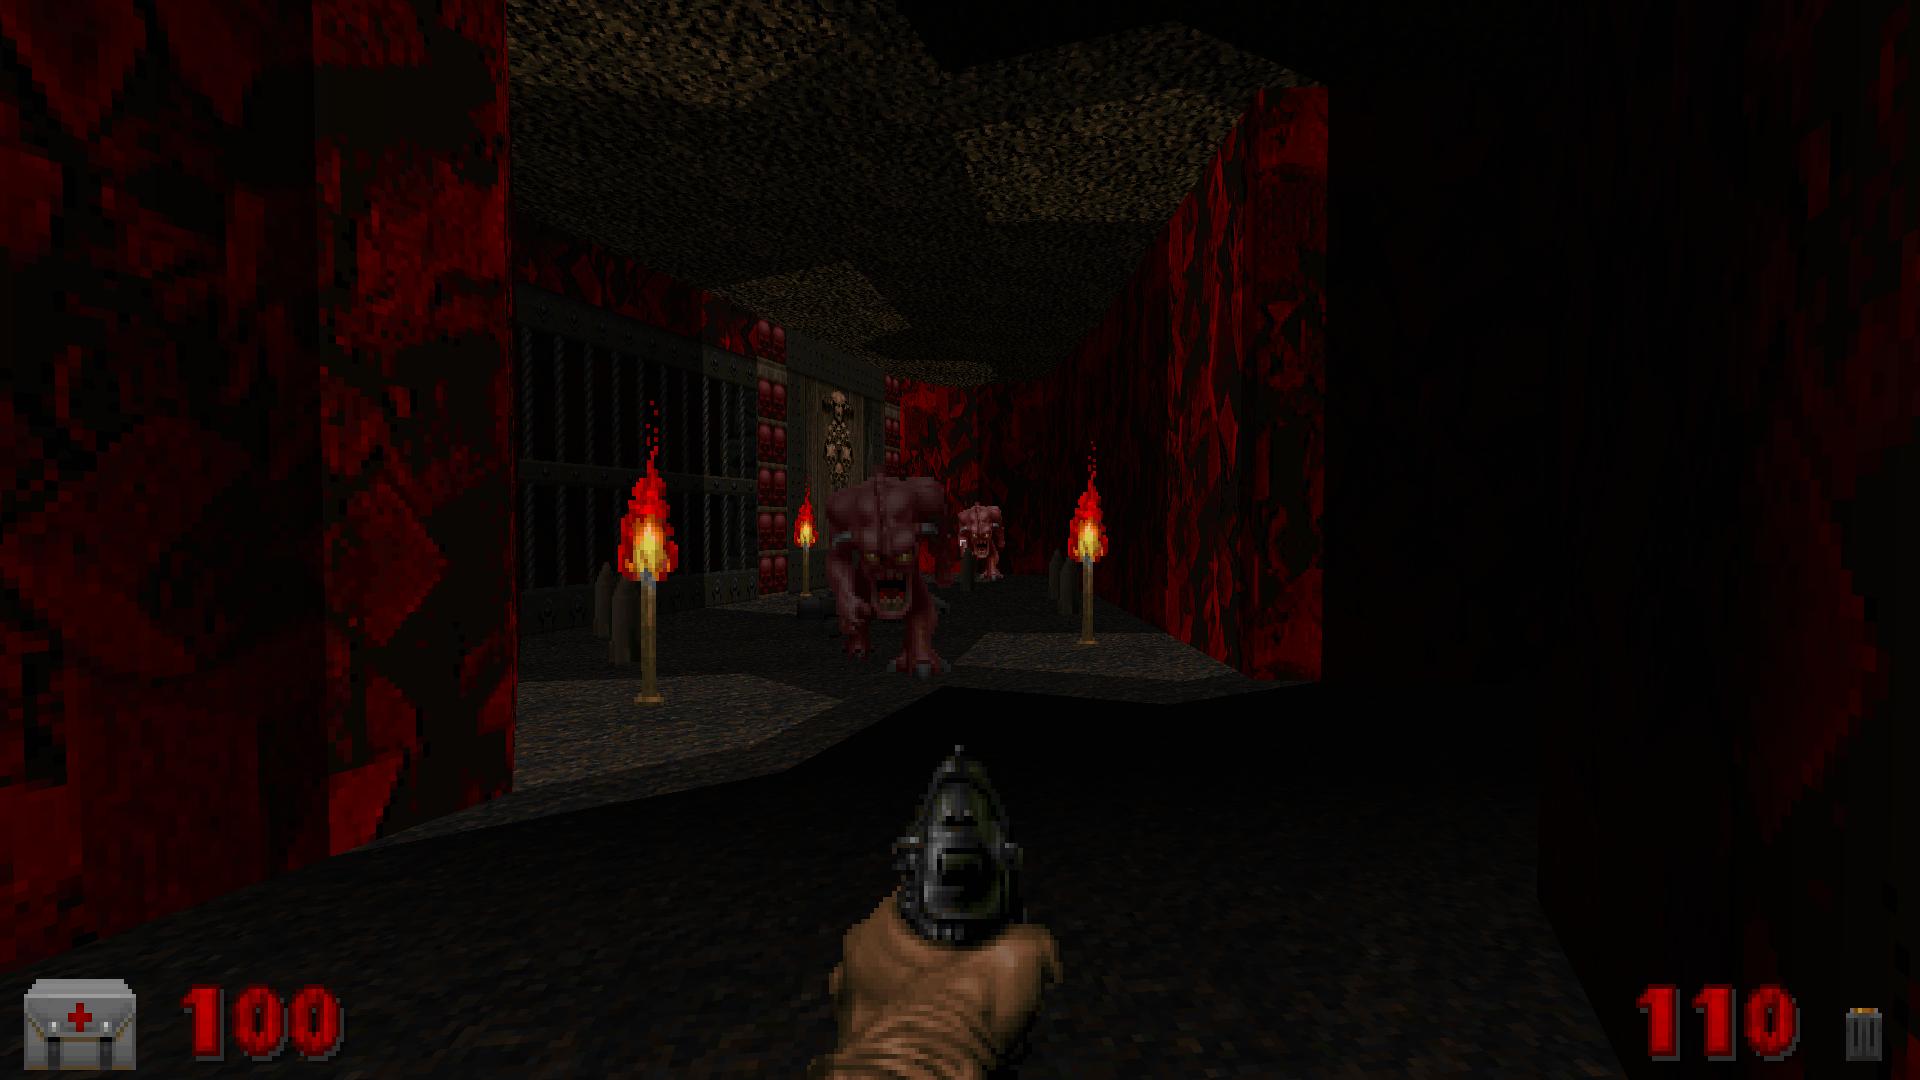 Screenshot_Doom_20200419_123951.png.5aa2e44d8e17ccda9c2c0791e15e09d2.png